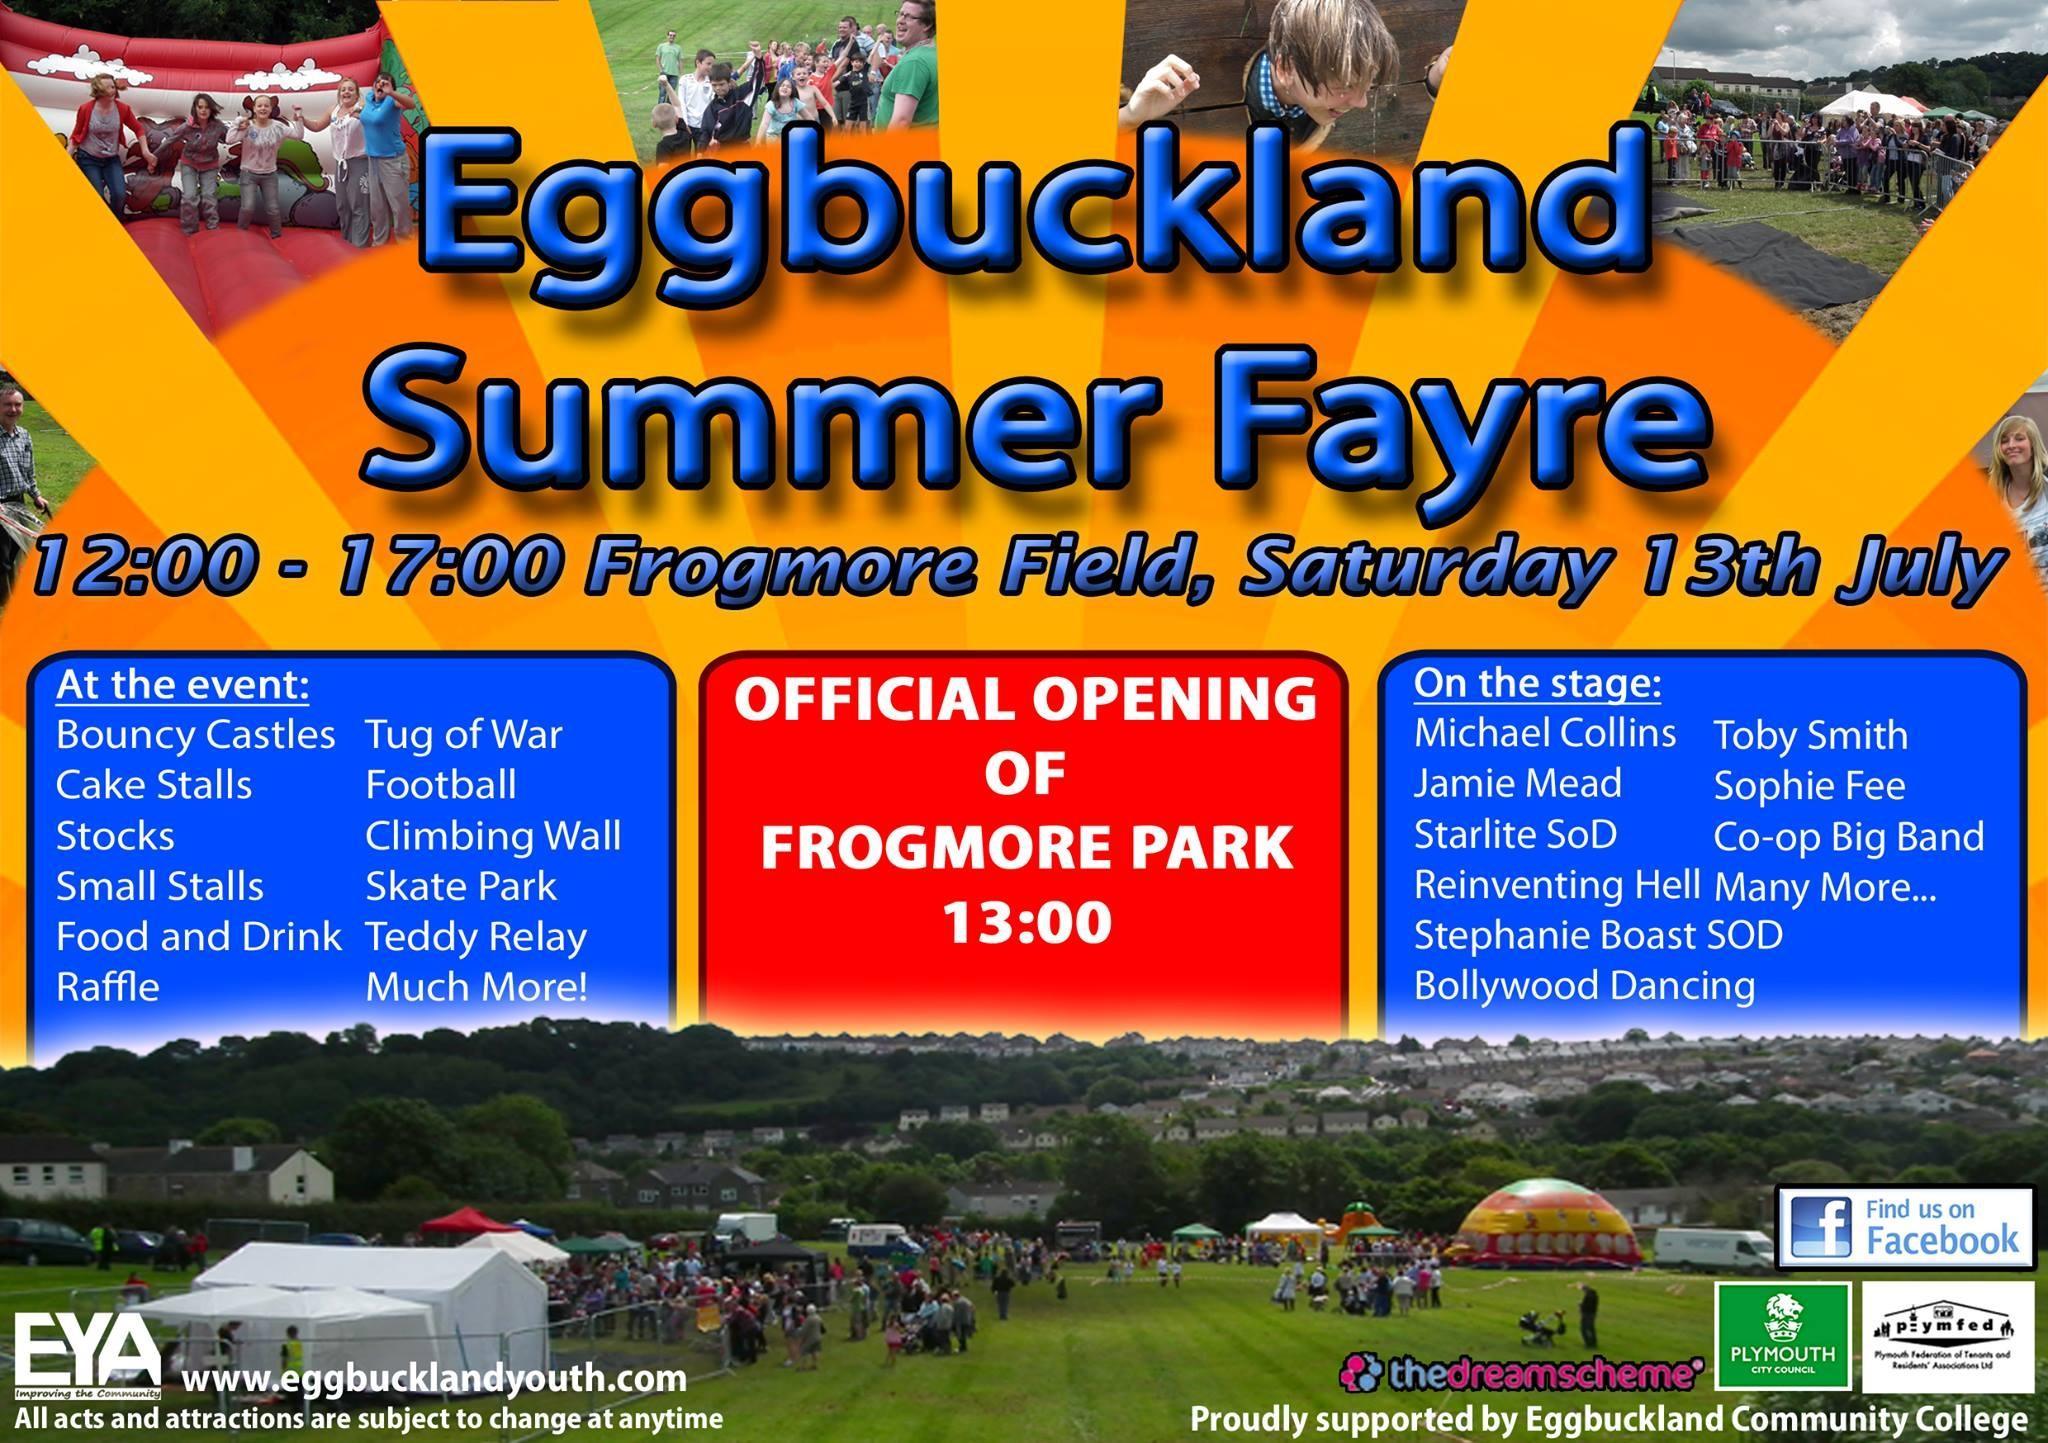 Eggbuckland Summer Fayre